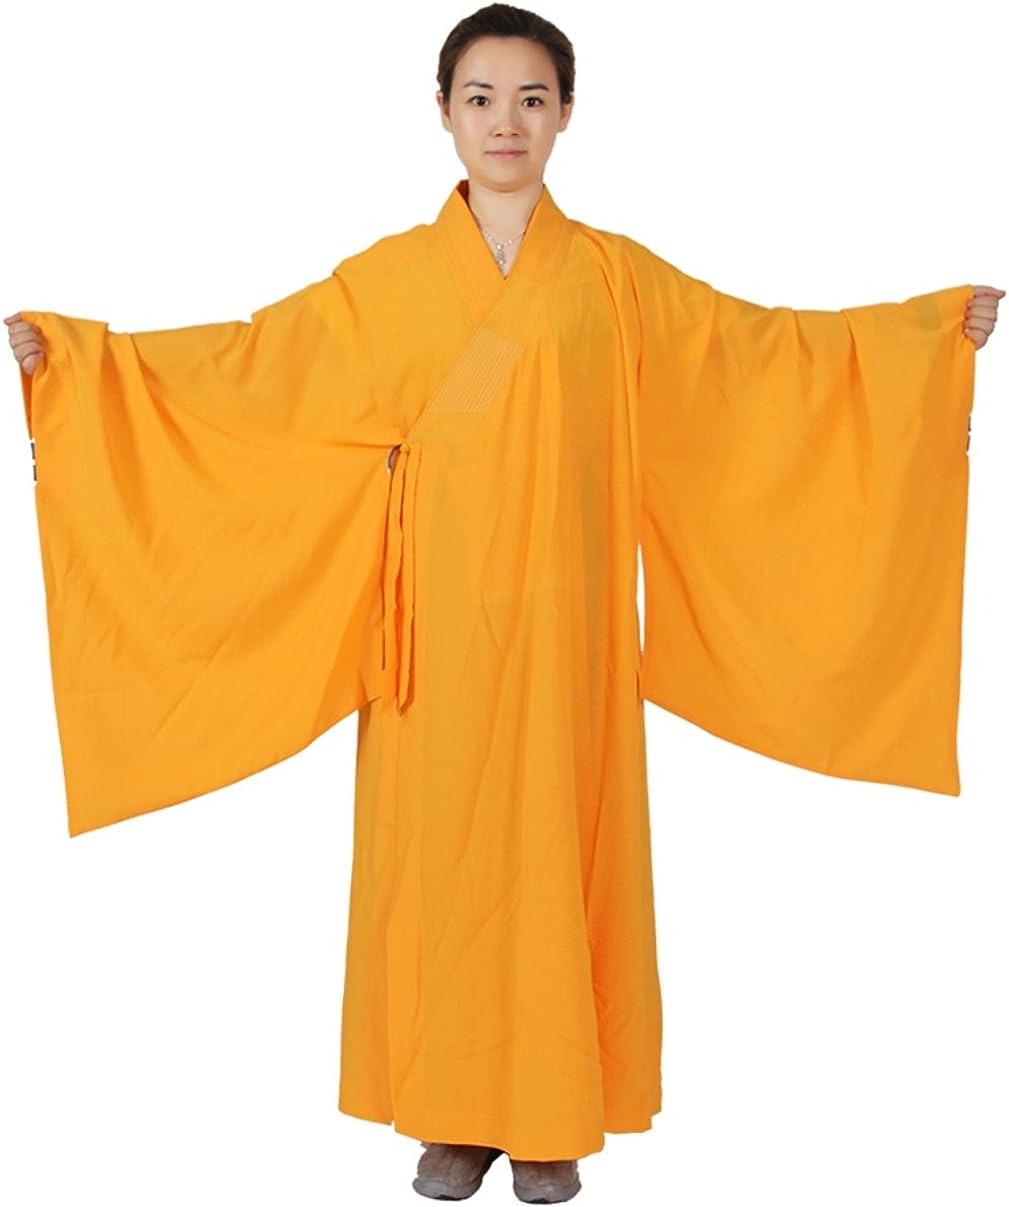 ZanYing Men Women Unisex Meditation Robe Wide Sleeves Buddhist Monk Outfit